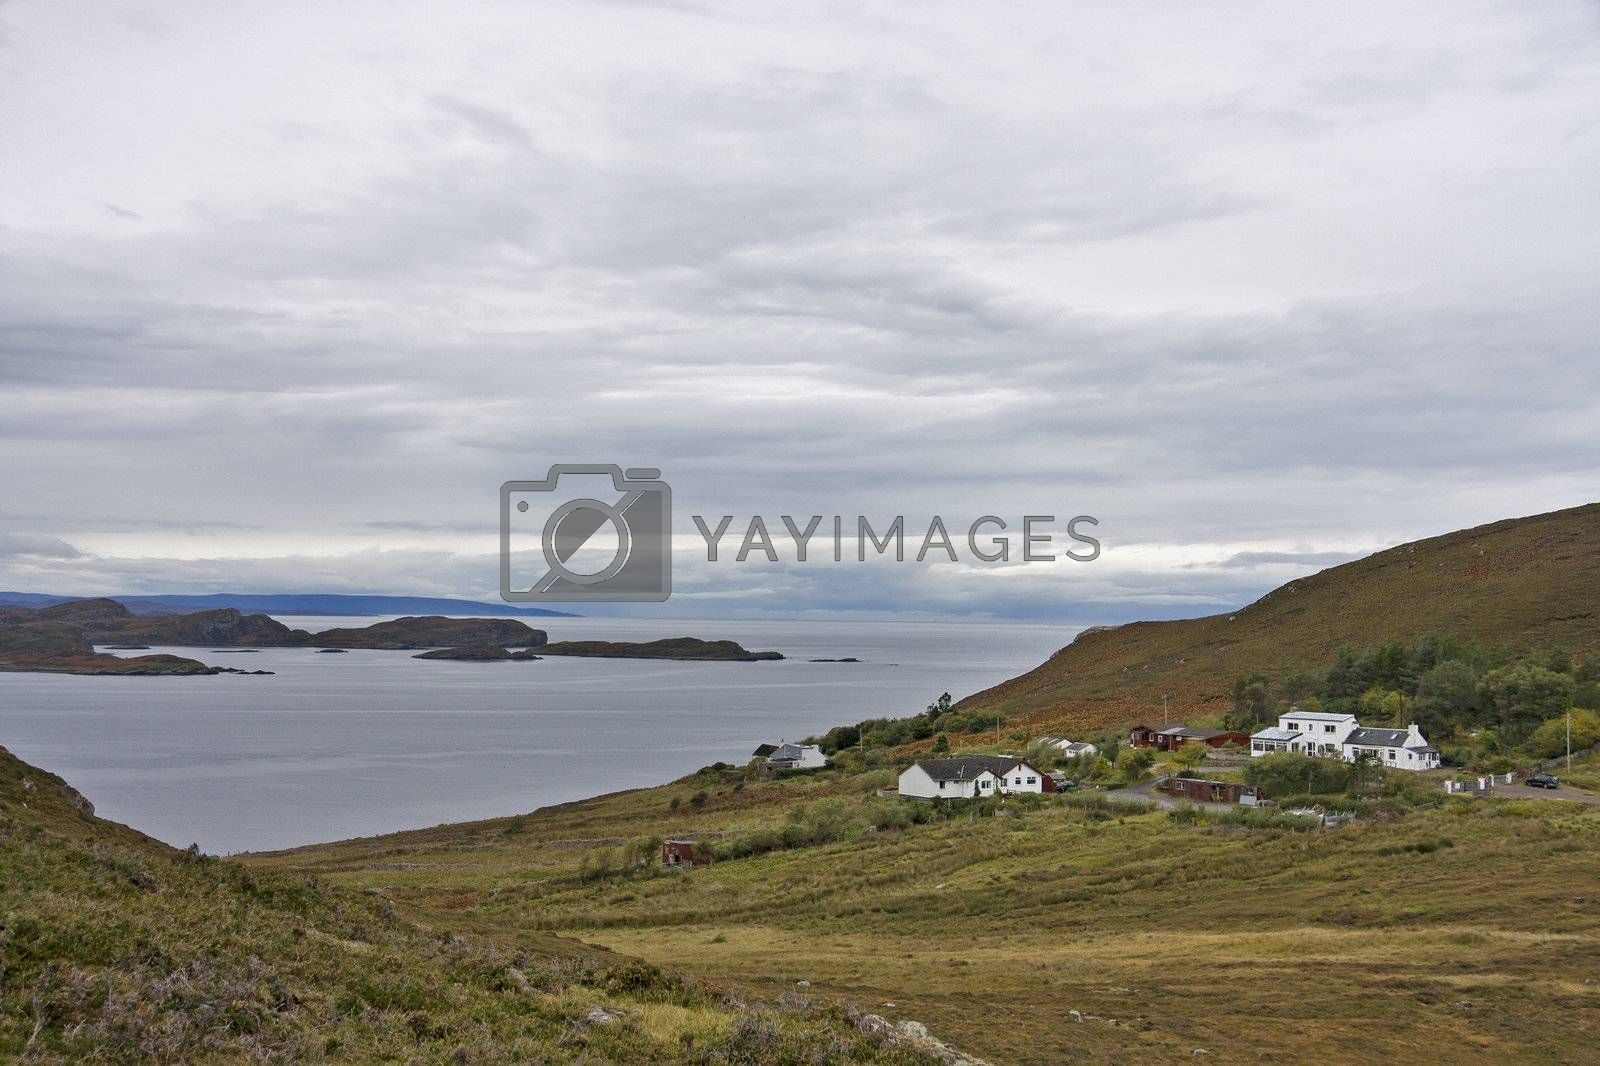 remote estate at coastline in scotland with wetland in front